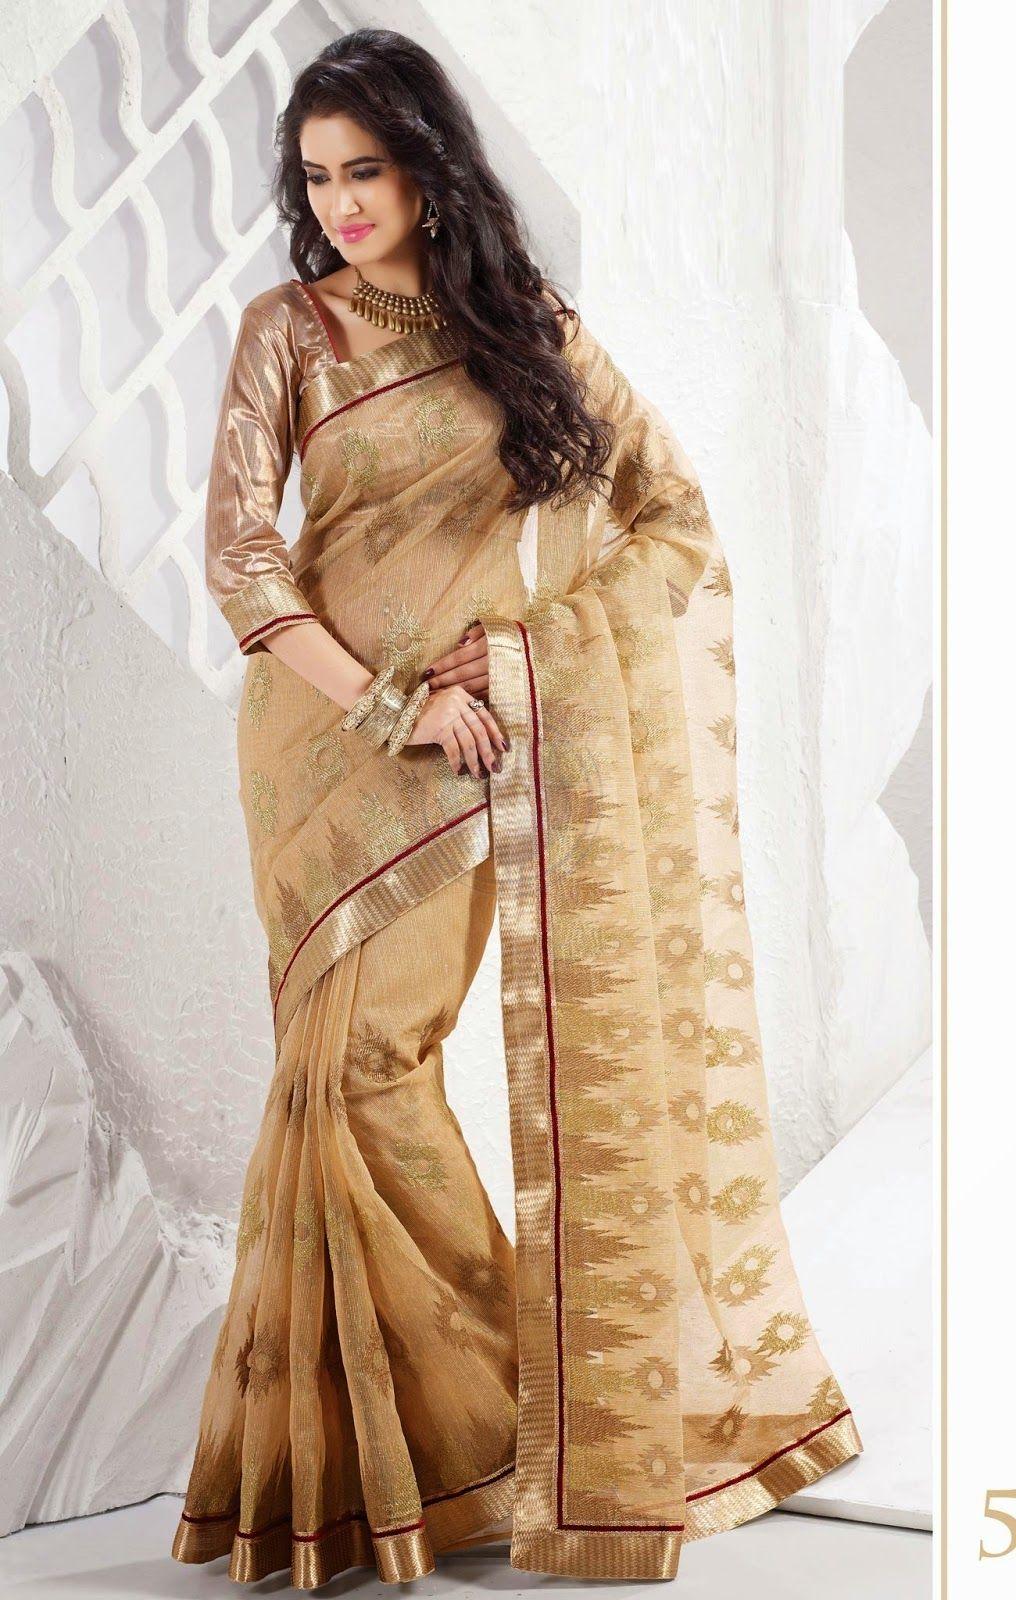 e4ca8119b1 Chennai Silks Fancy Designer Saree collections | Saree | Saree ...